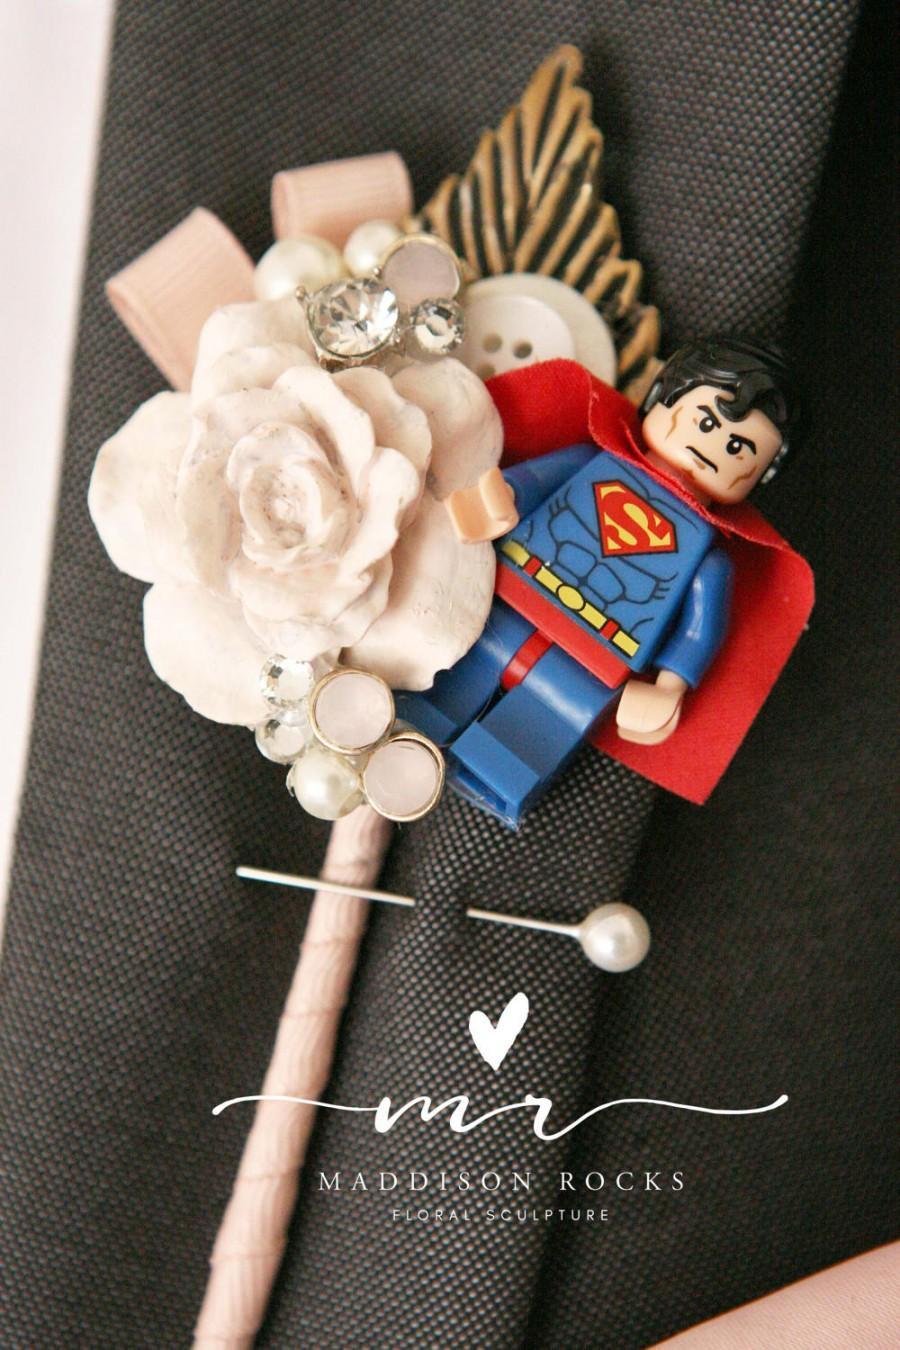 Hochzeit - Custom Superhero, Minature figure Boutonnieres, Geek, Buttonholes, Wedding boutonnière, alternative, comics, buttonhole, wedding corsage